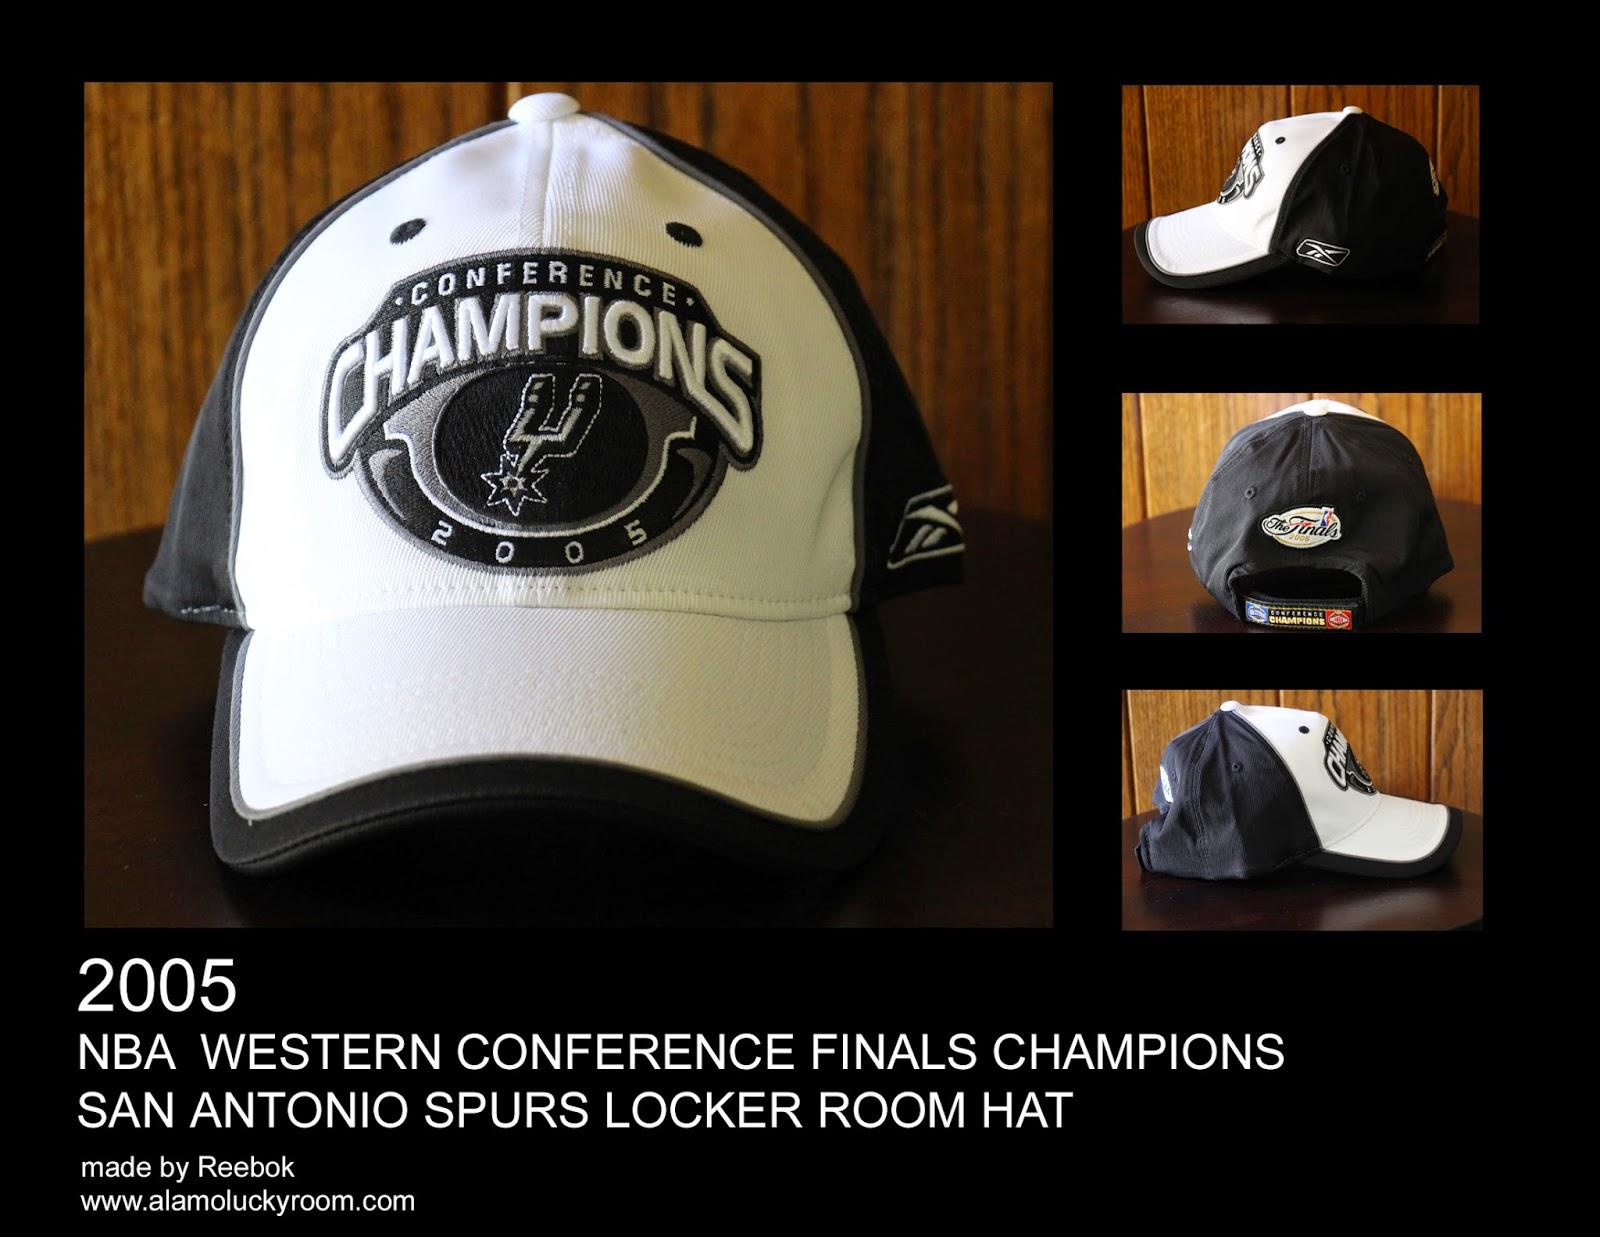 feff5ad7c9a 2005 San Antonio Spurs NBA Western Conference Finals Champions Locker Room  Hat